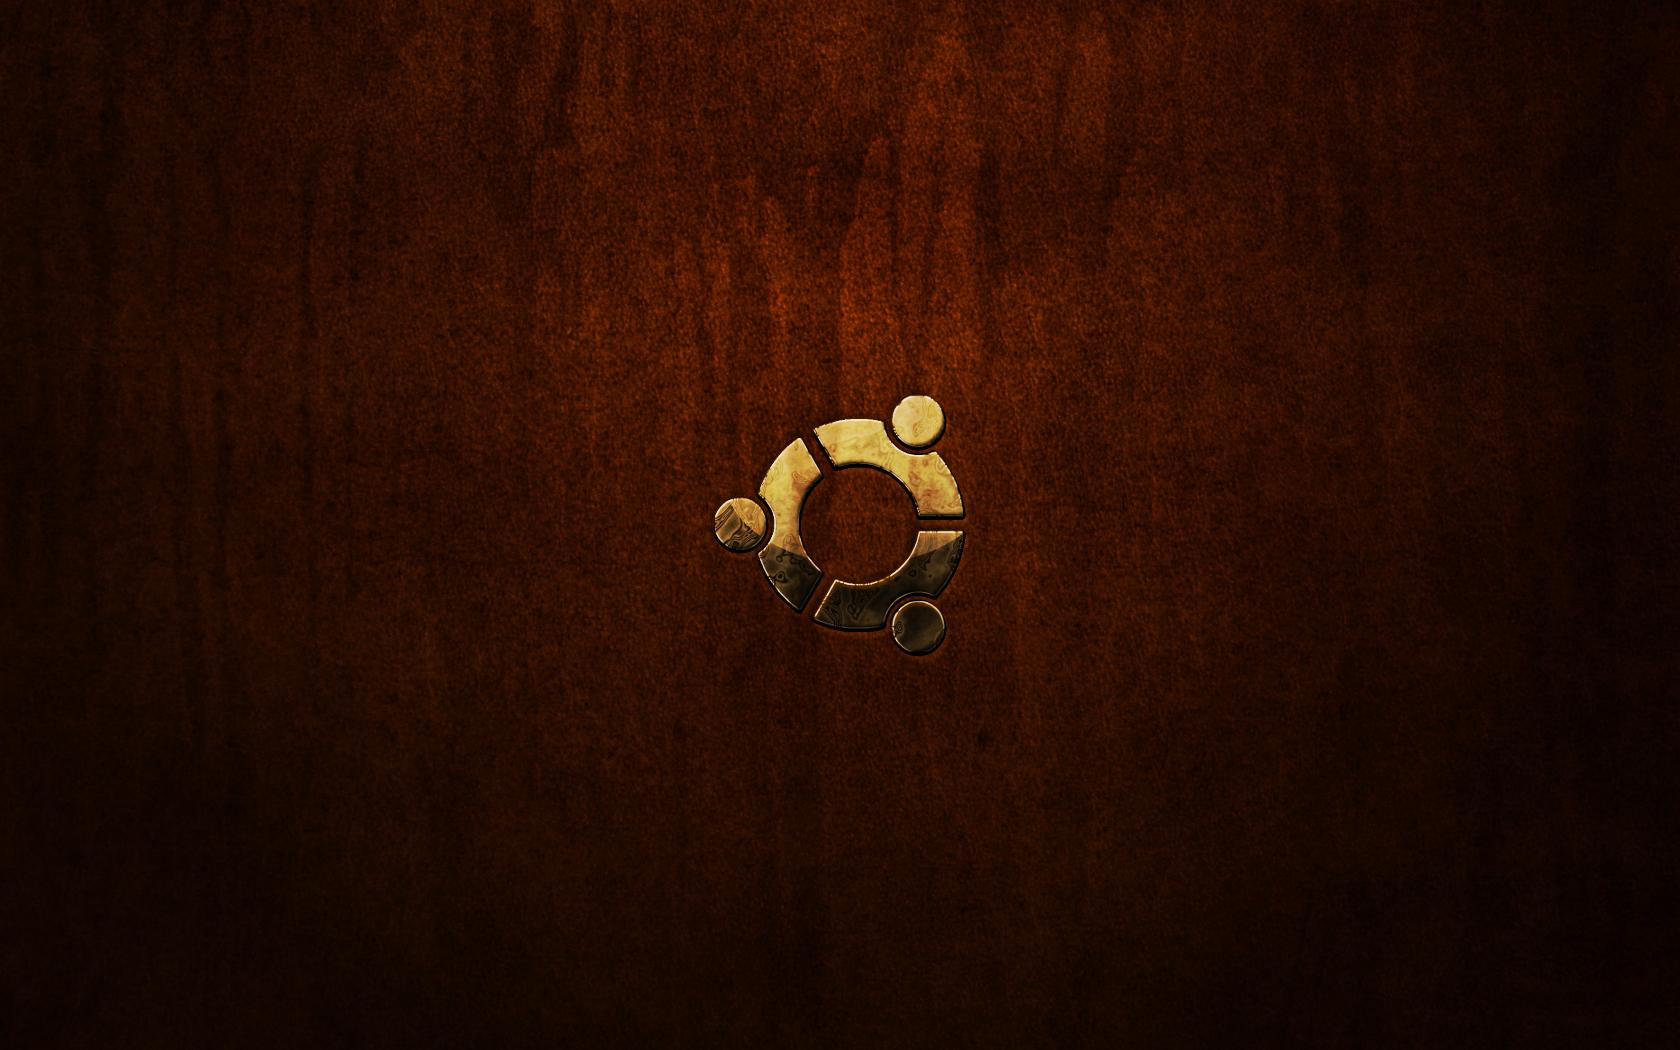 Ubuntu Brown leather distress by monkeymagico